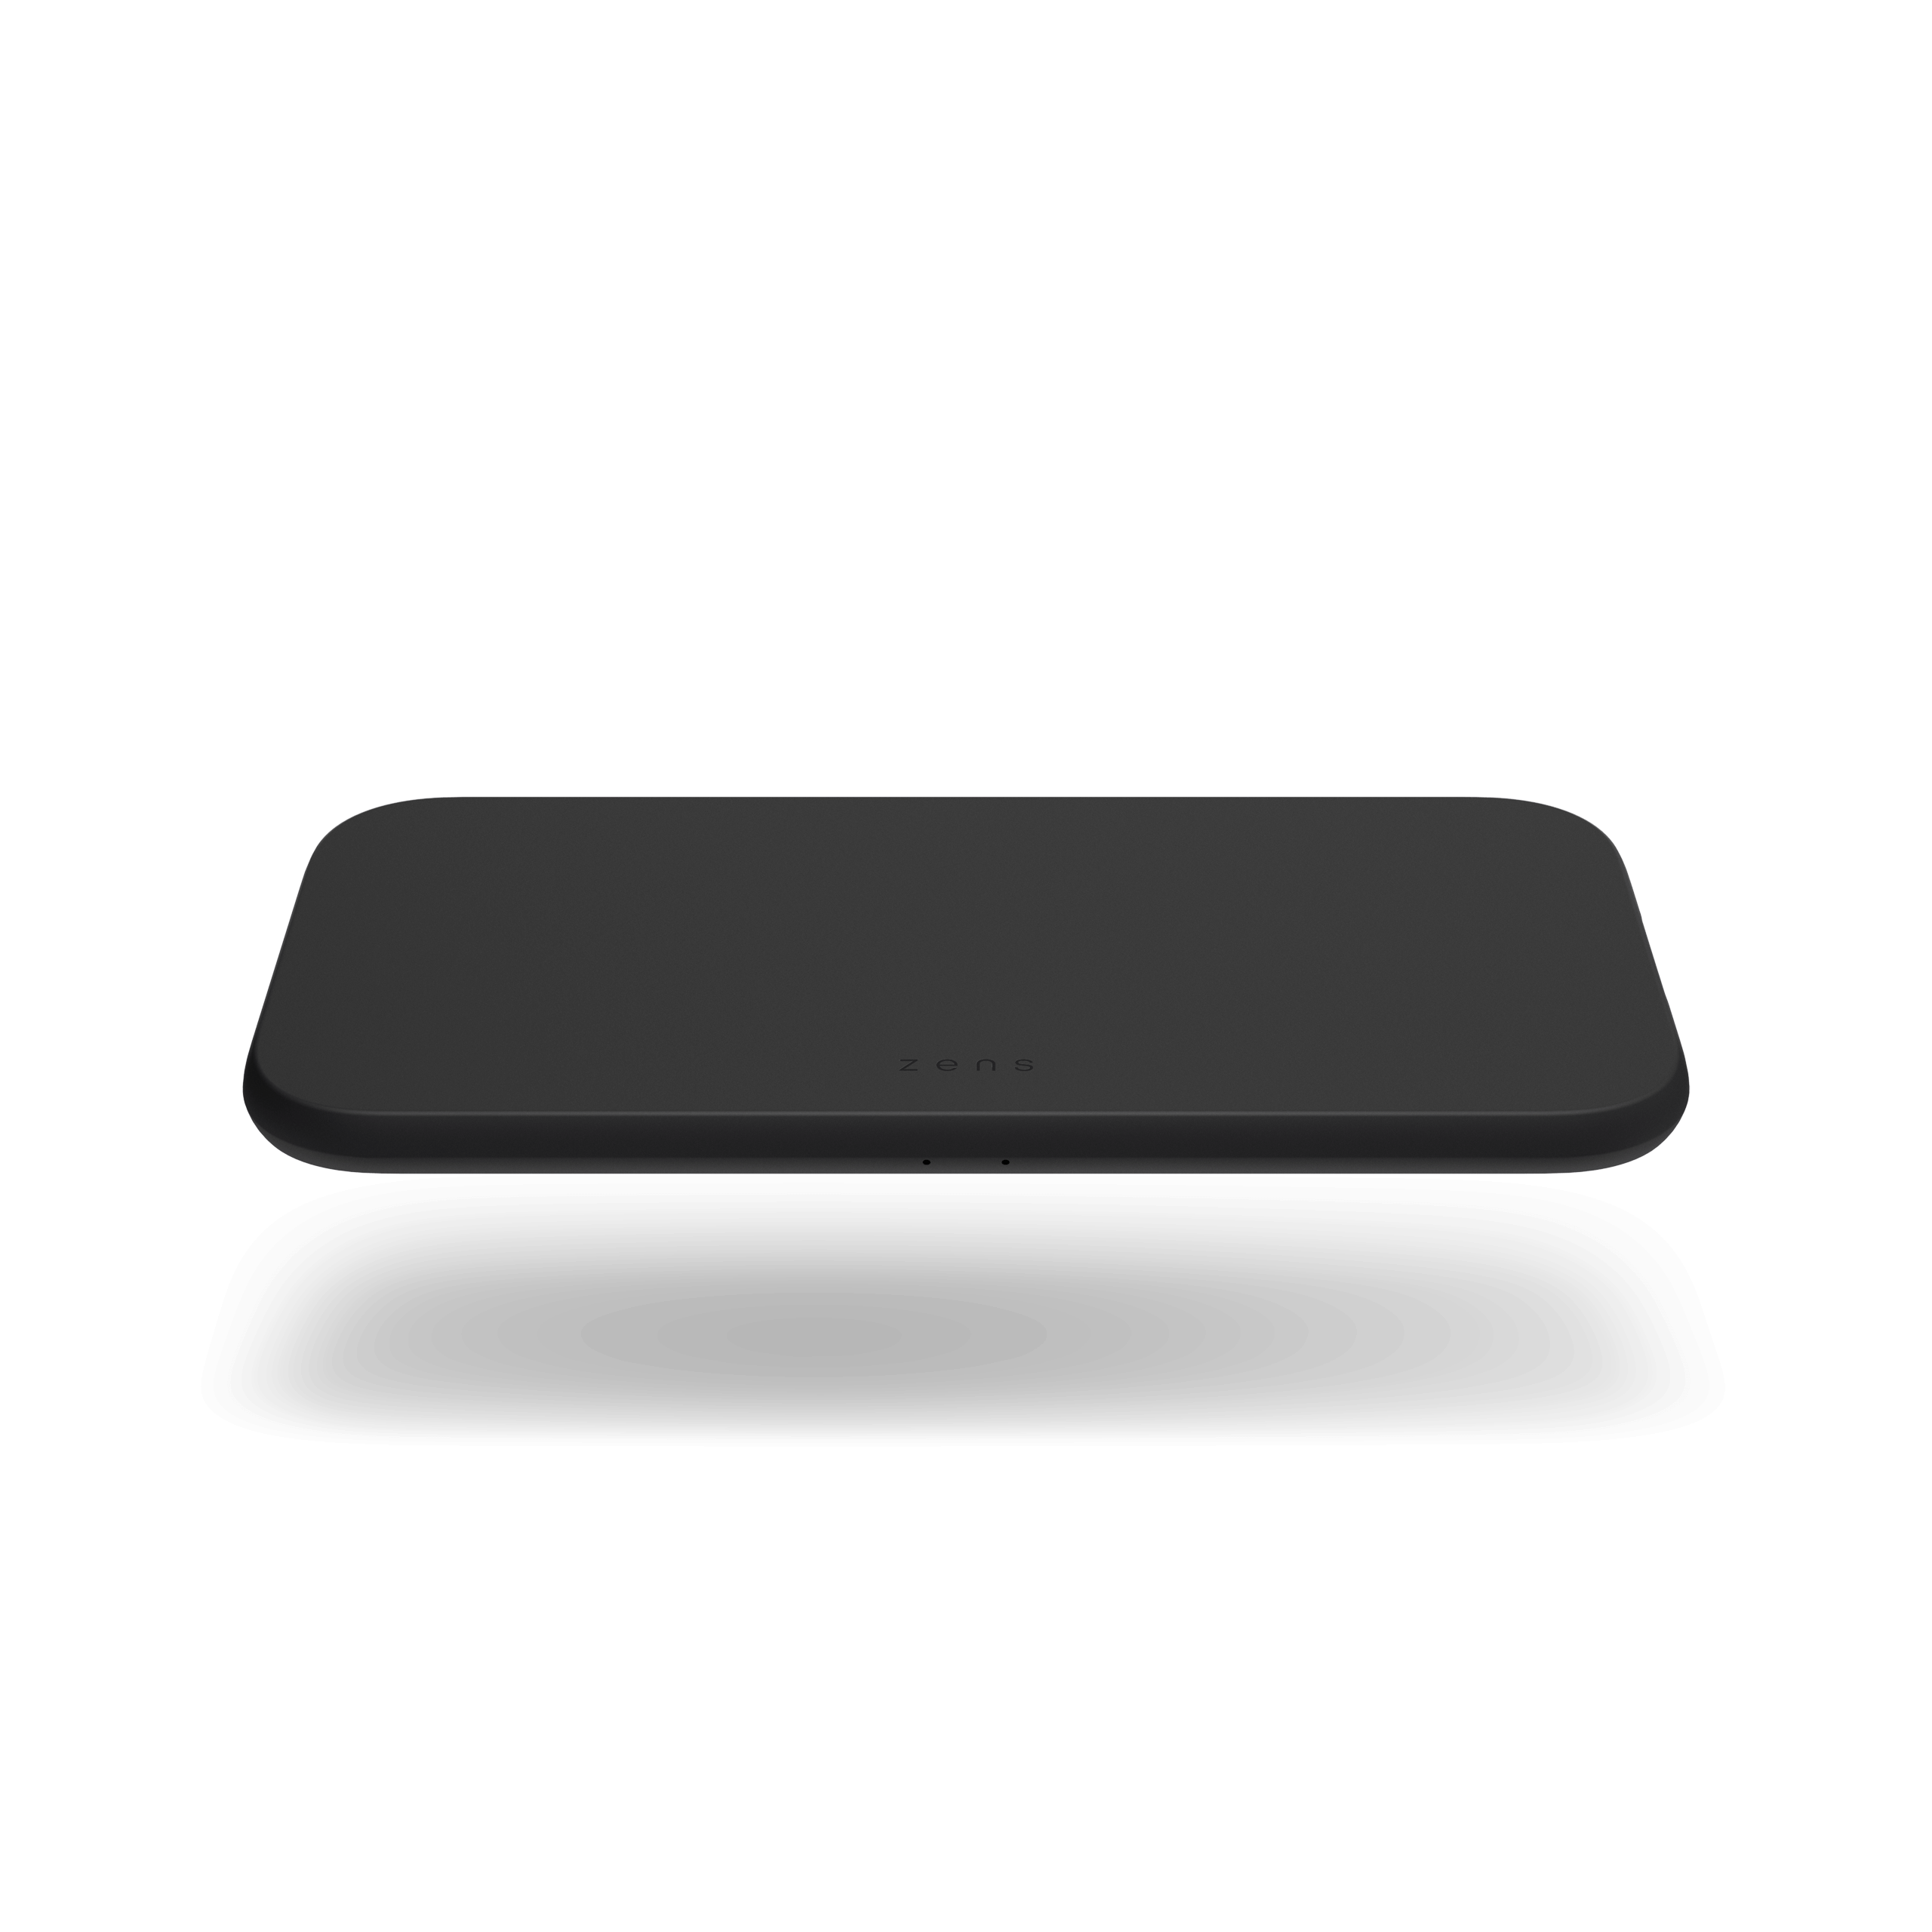 ZEDC12B - Zens Dual Wireless Charger Front Top View